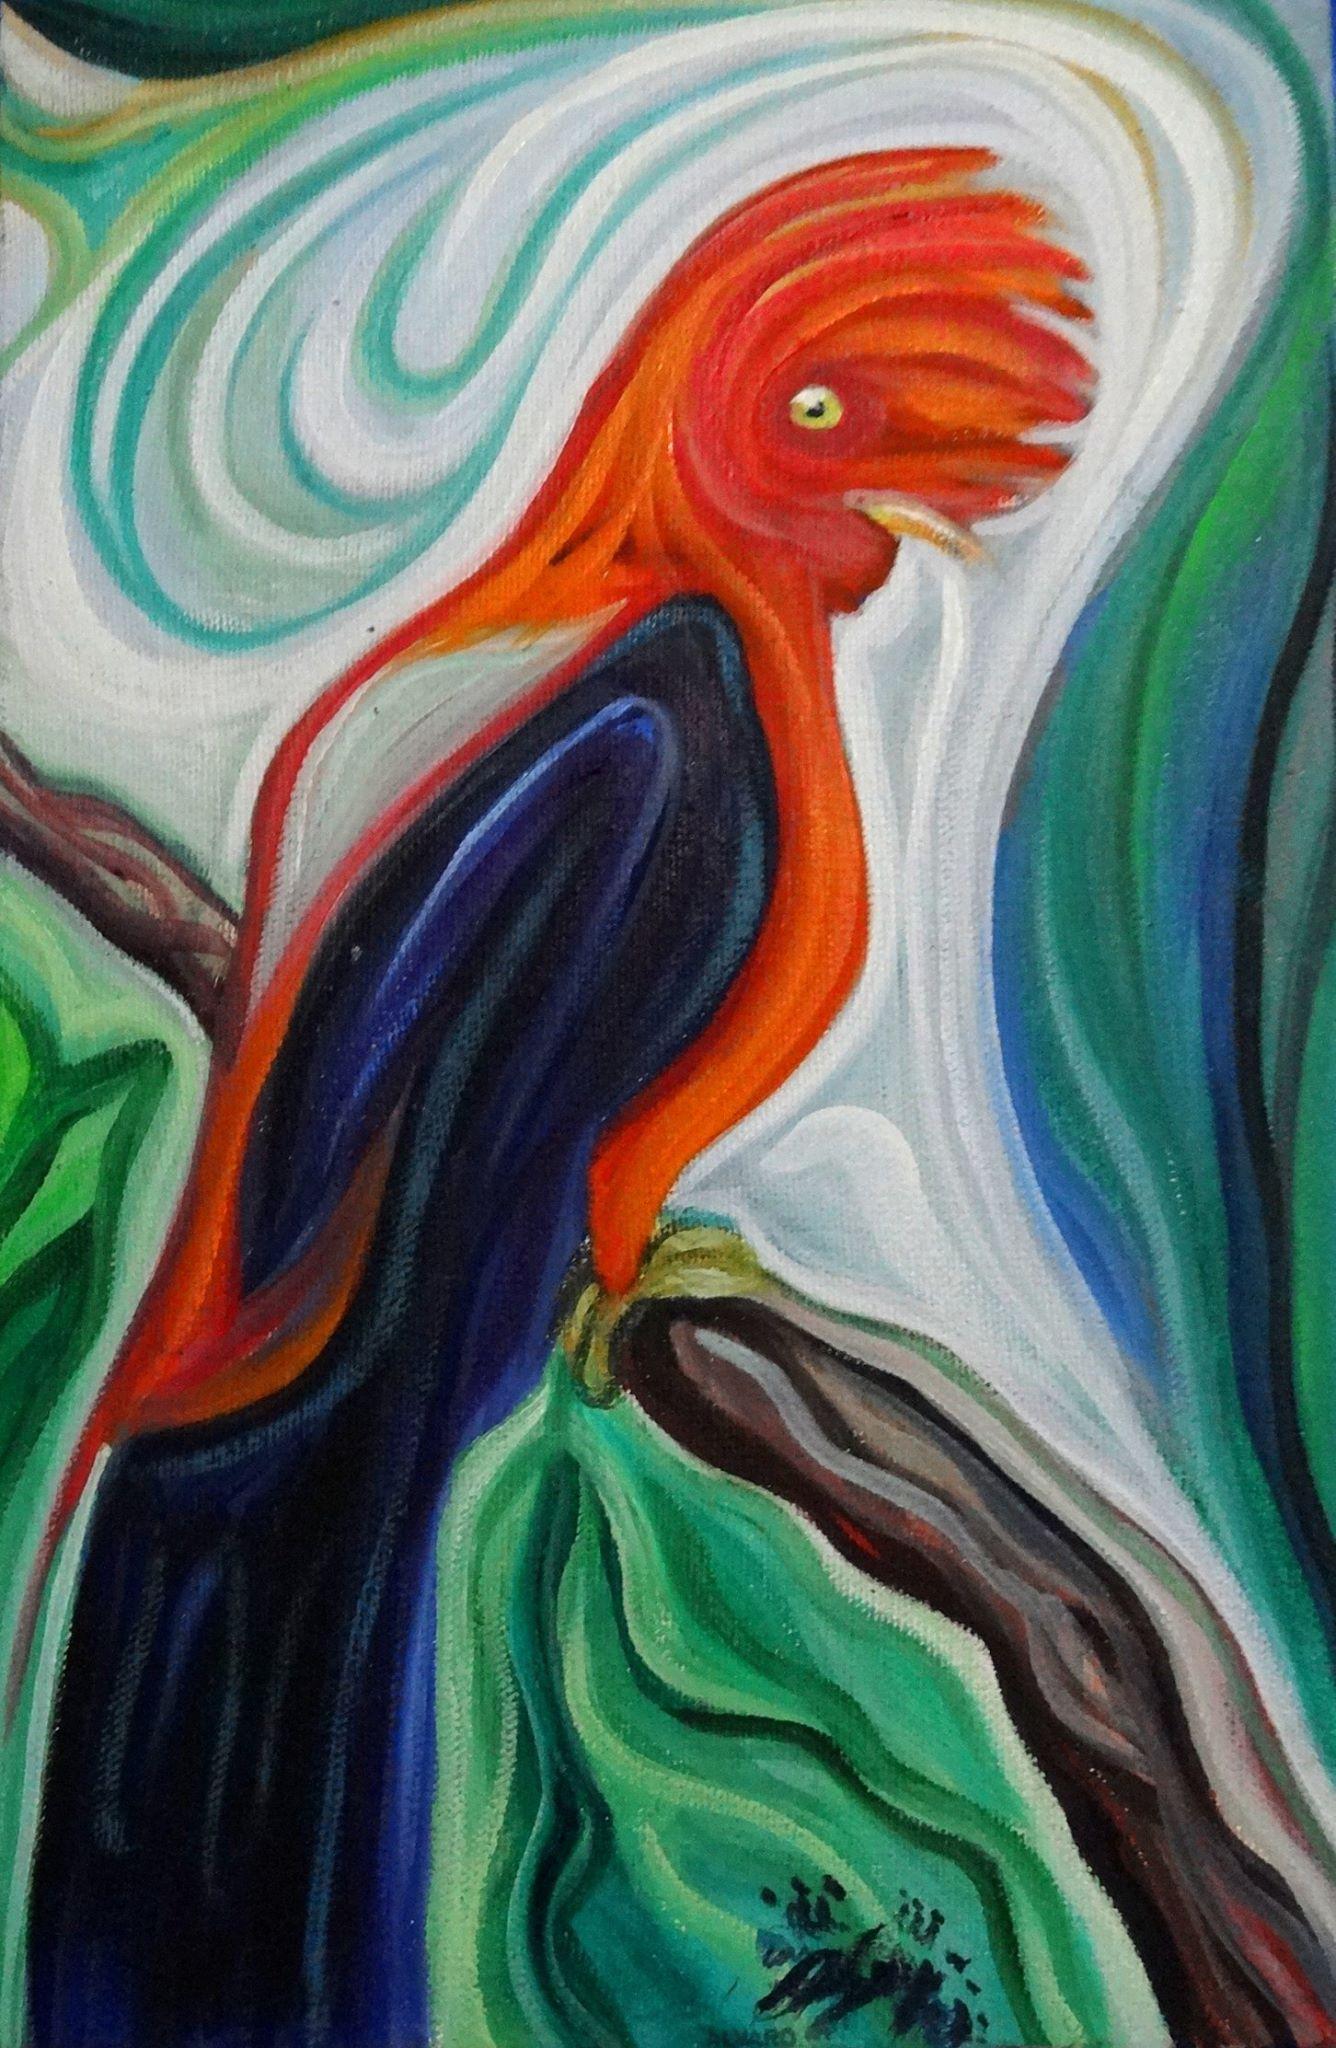 Gallito de las rocas / Óleo sobre lienzo / 30 x 20 cm / 2015